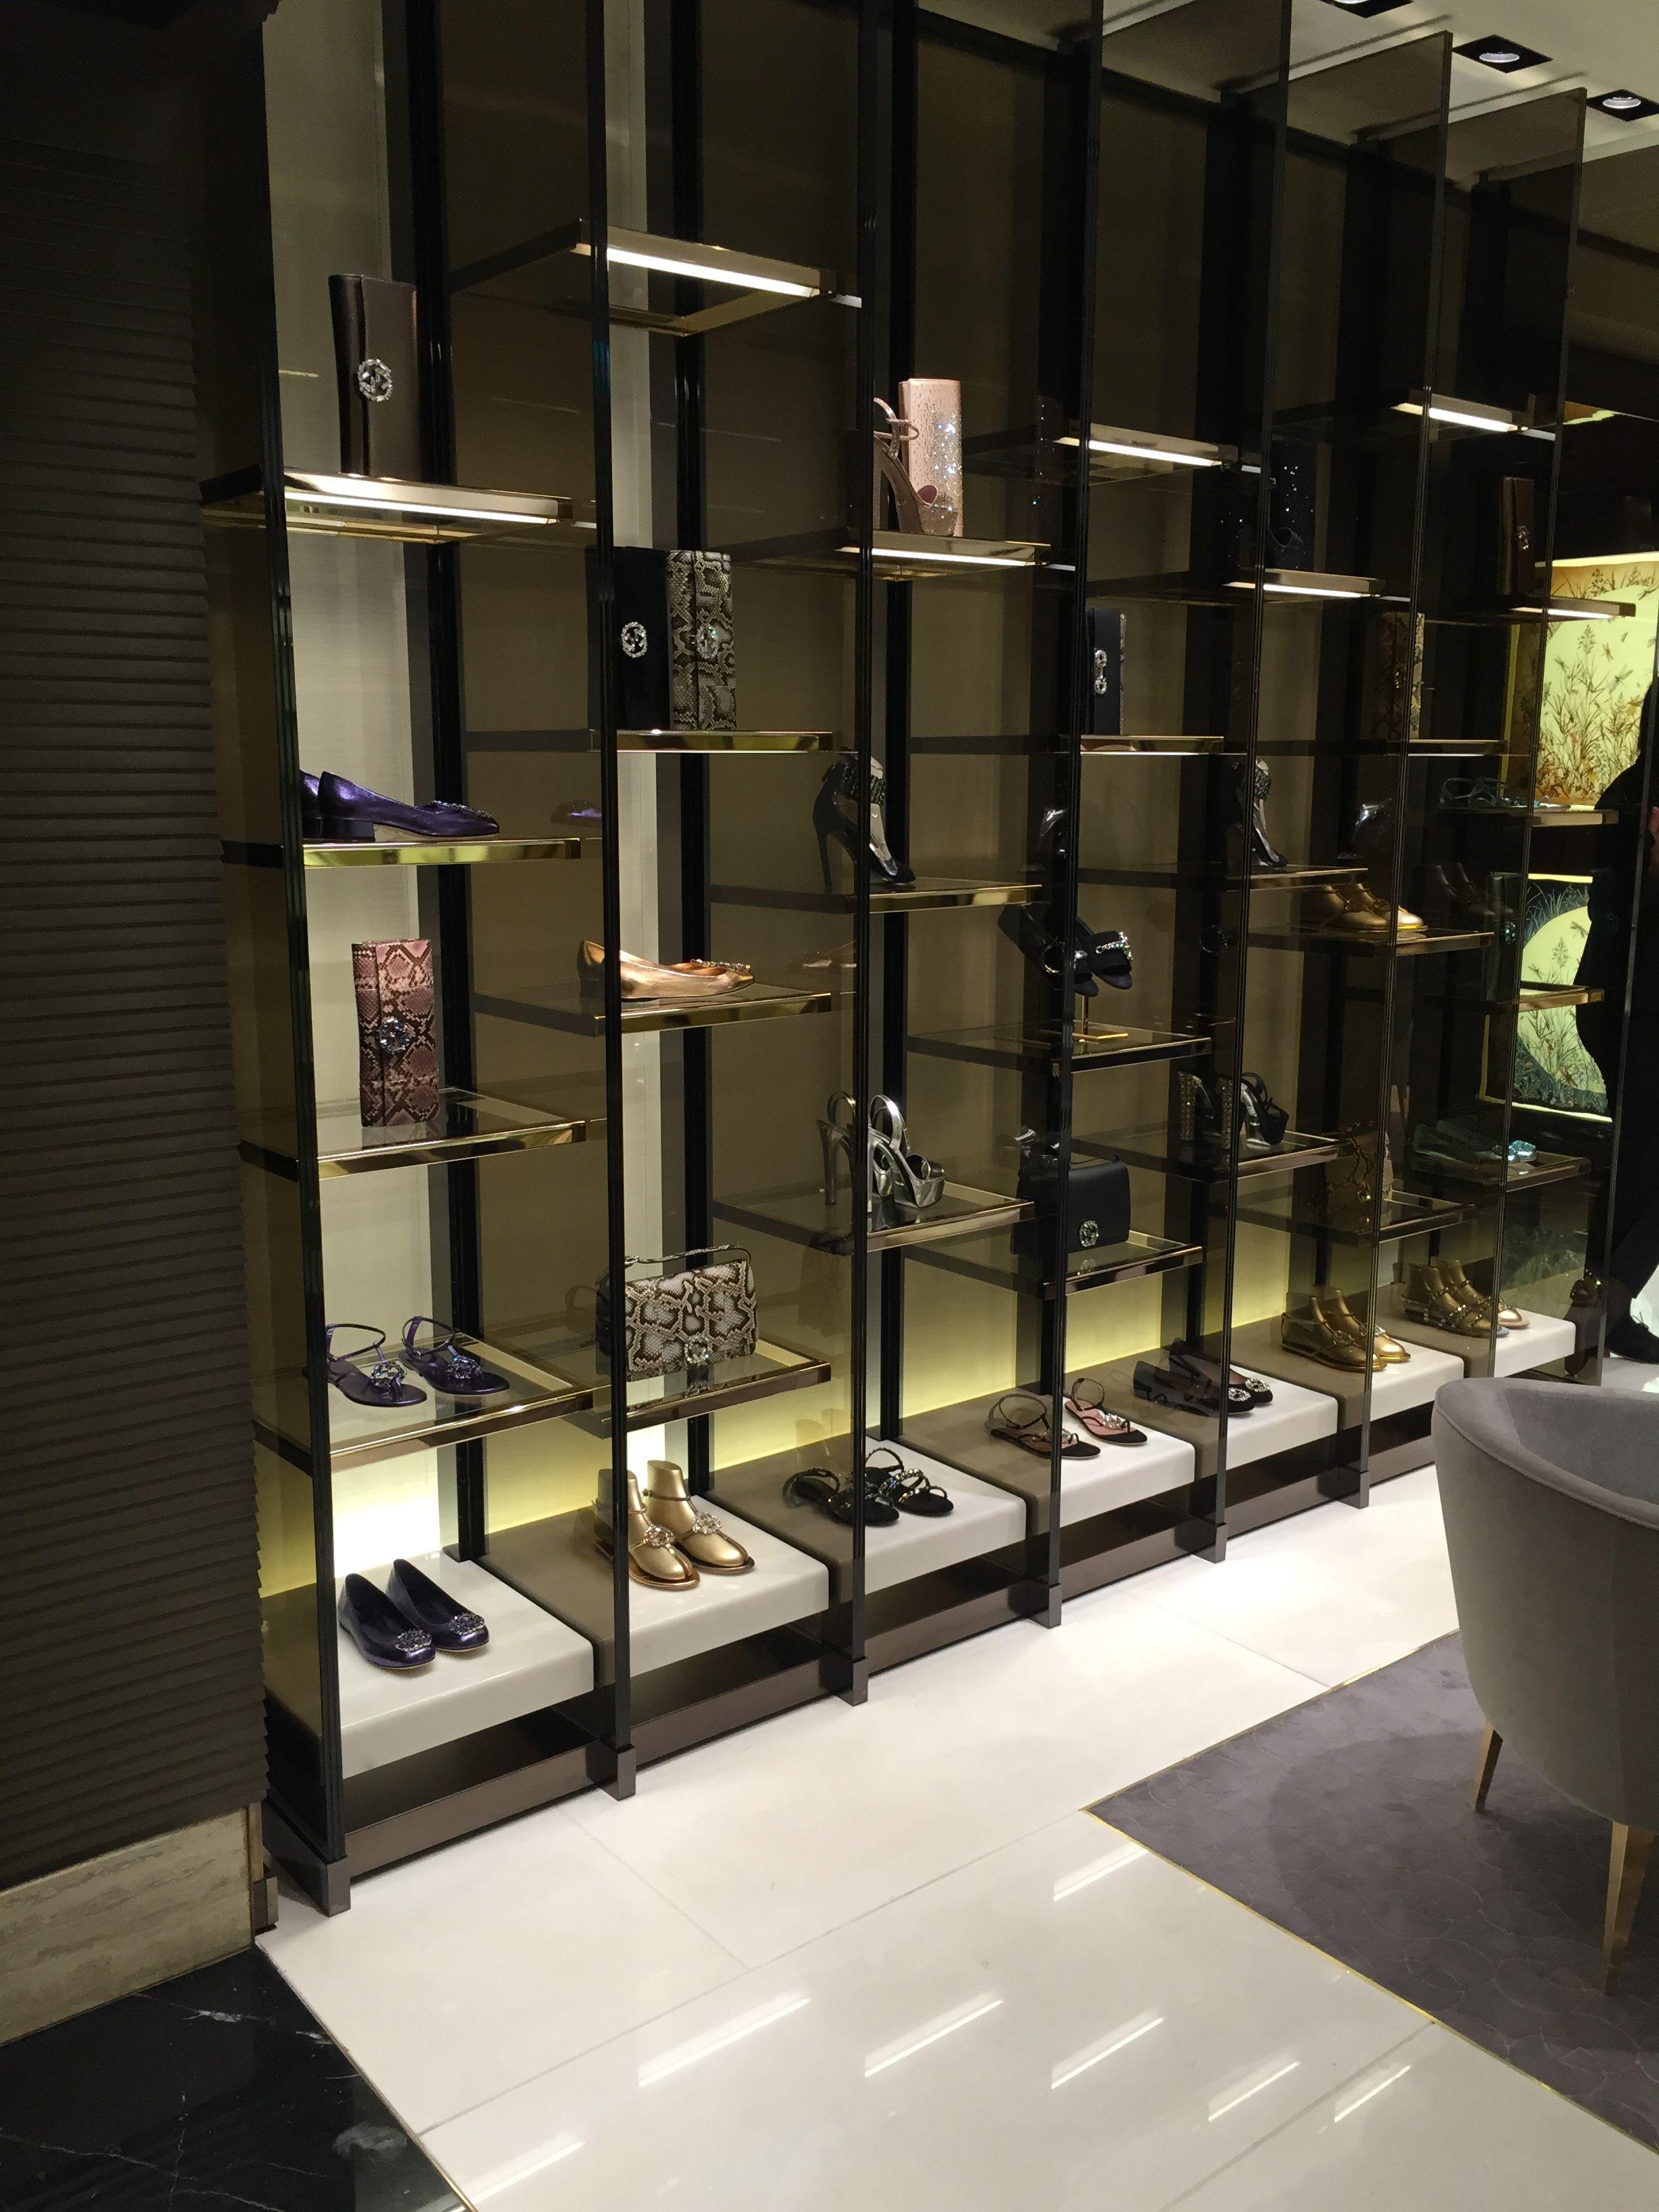 01490df49 Lovely Gucci display in Harrods Shoe Heaven! #Harrods #shopping #retail  #luxury